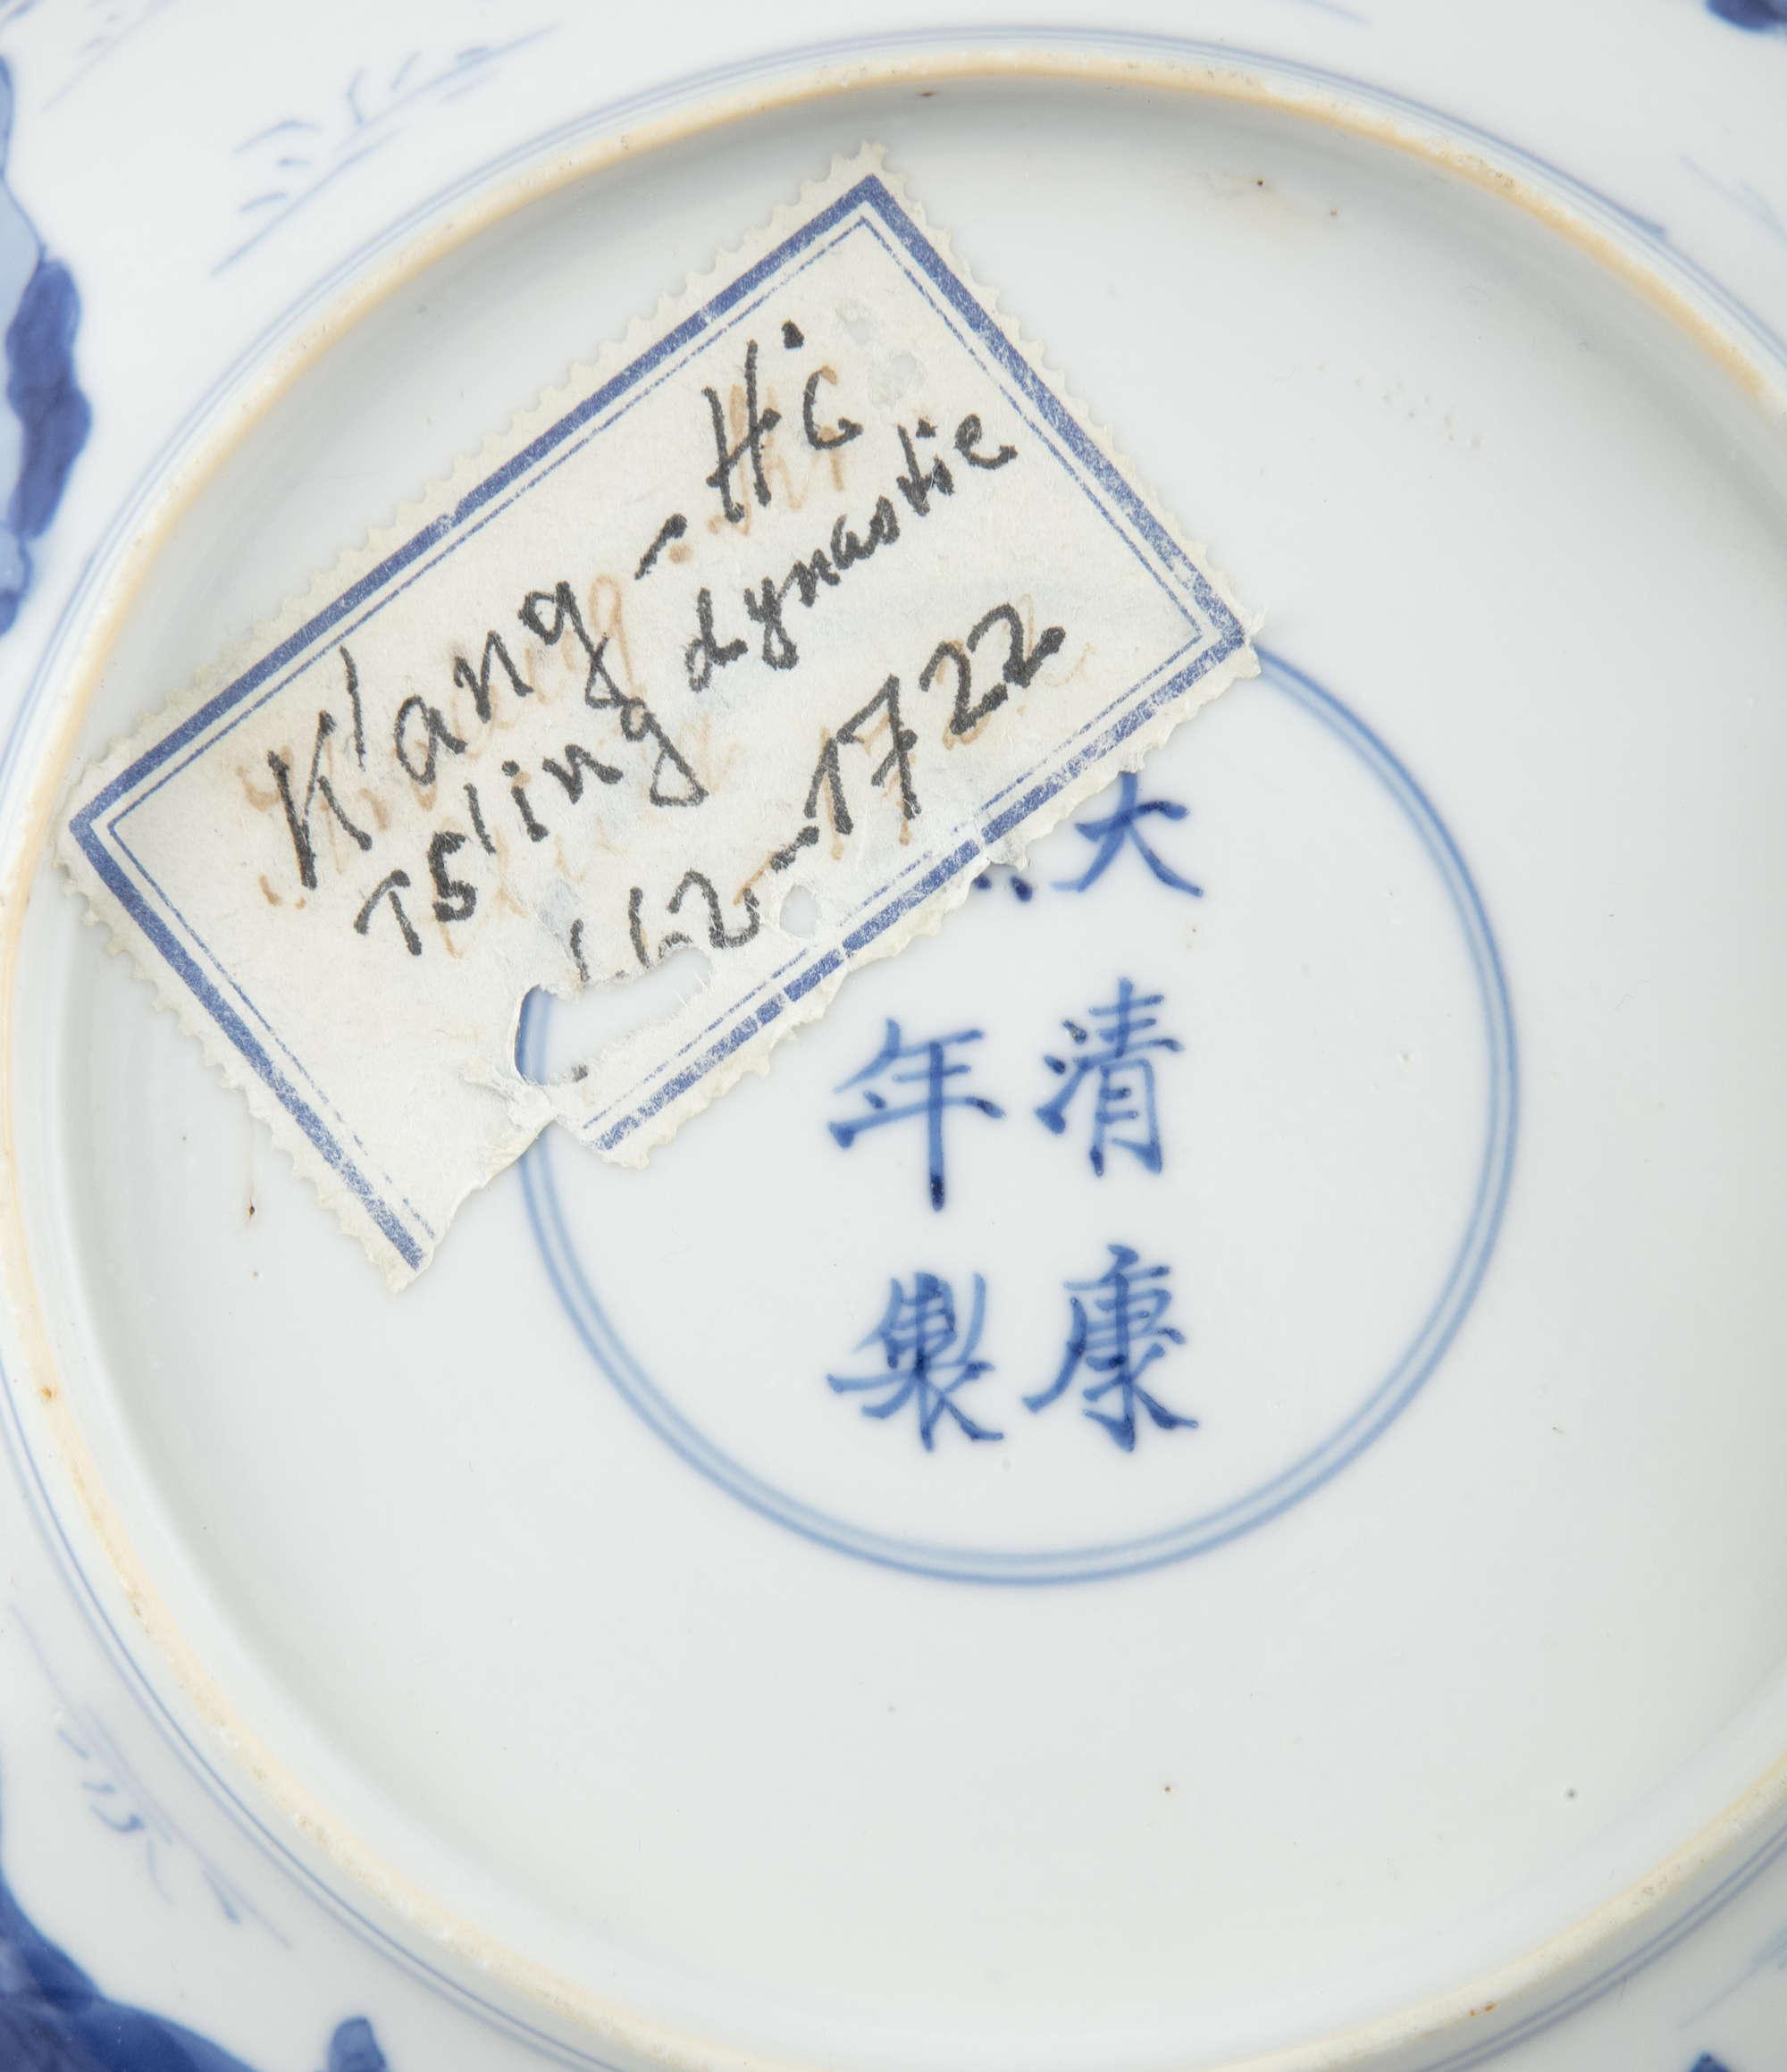 A BLUE AND WHITE 'EIGHT HORSES OF WANG MU' PORCELAIN DISH China, Qing Dynasty, Kangxi mark and - Image 8 of 17